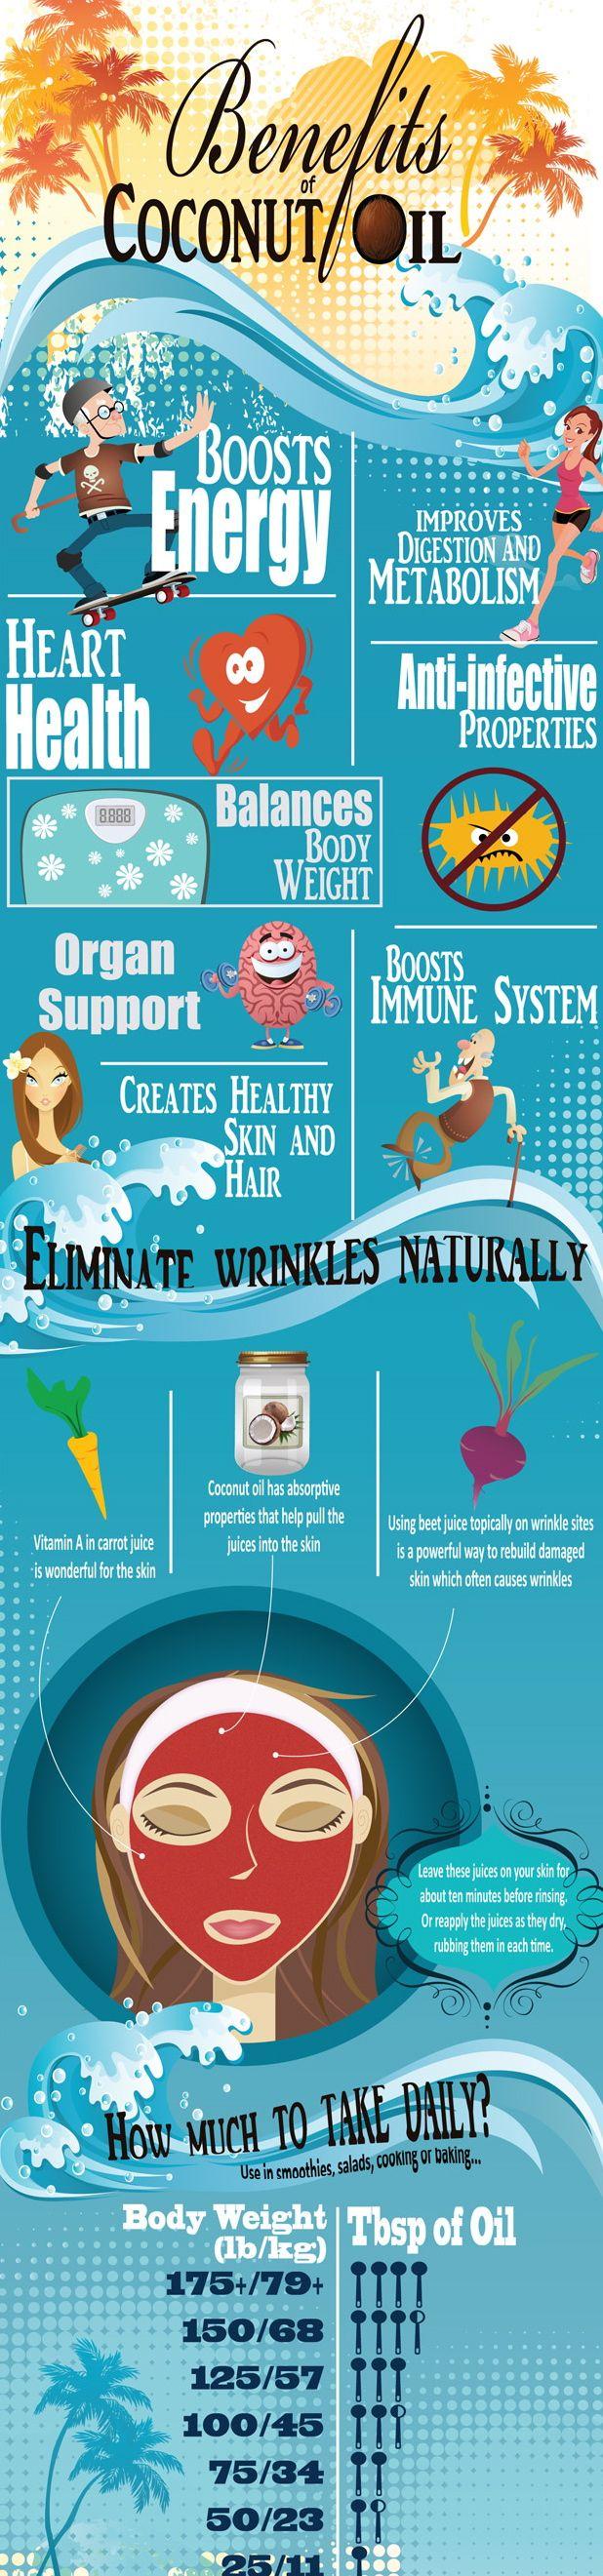 The Super Food Coconut Oil